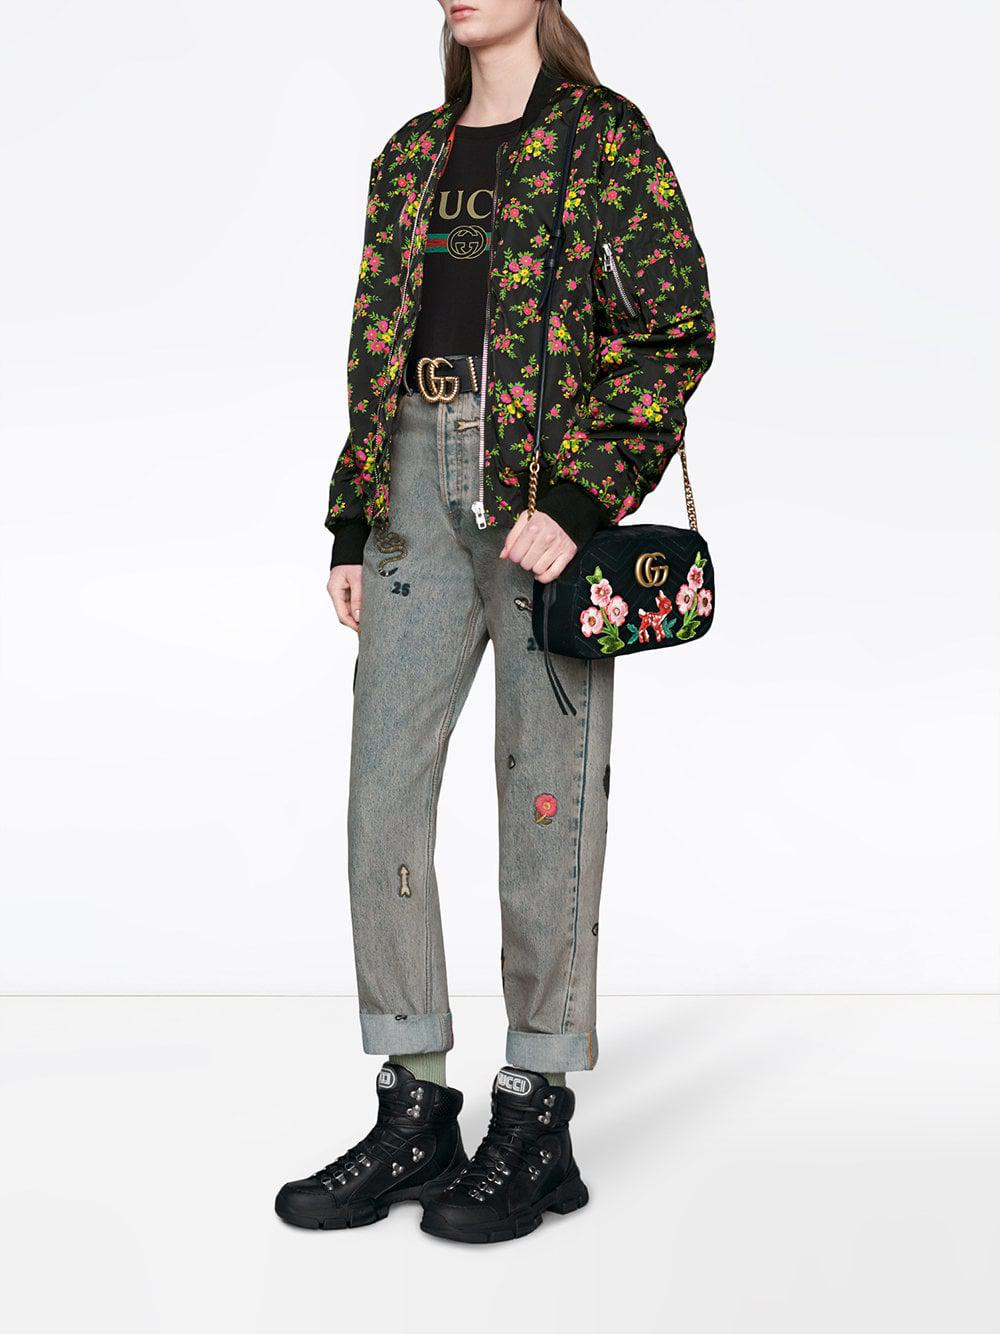 448ad40859c Gucci GG Marmont Velvet Small Shoulder Bag in Black - Lyst